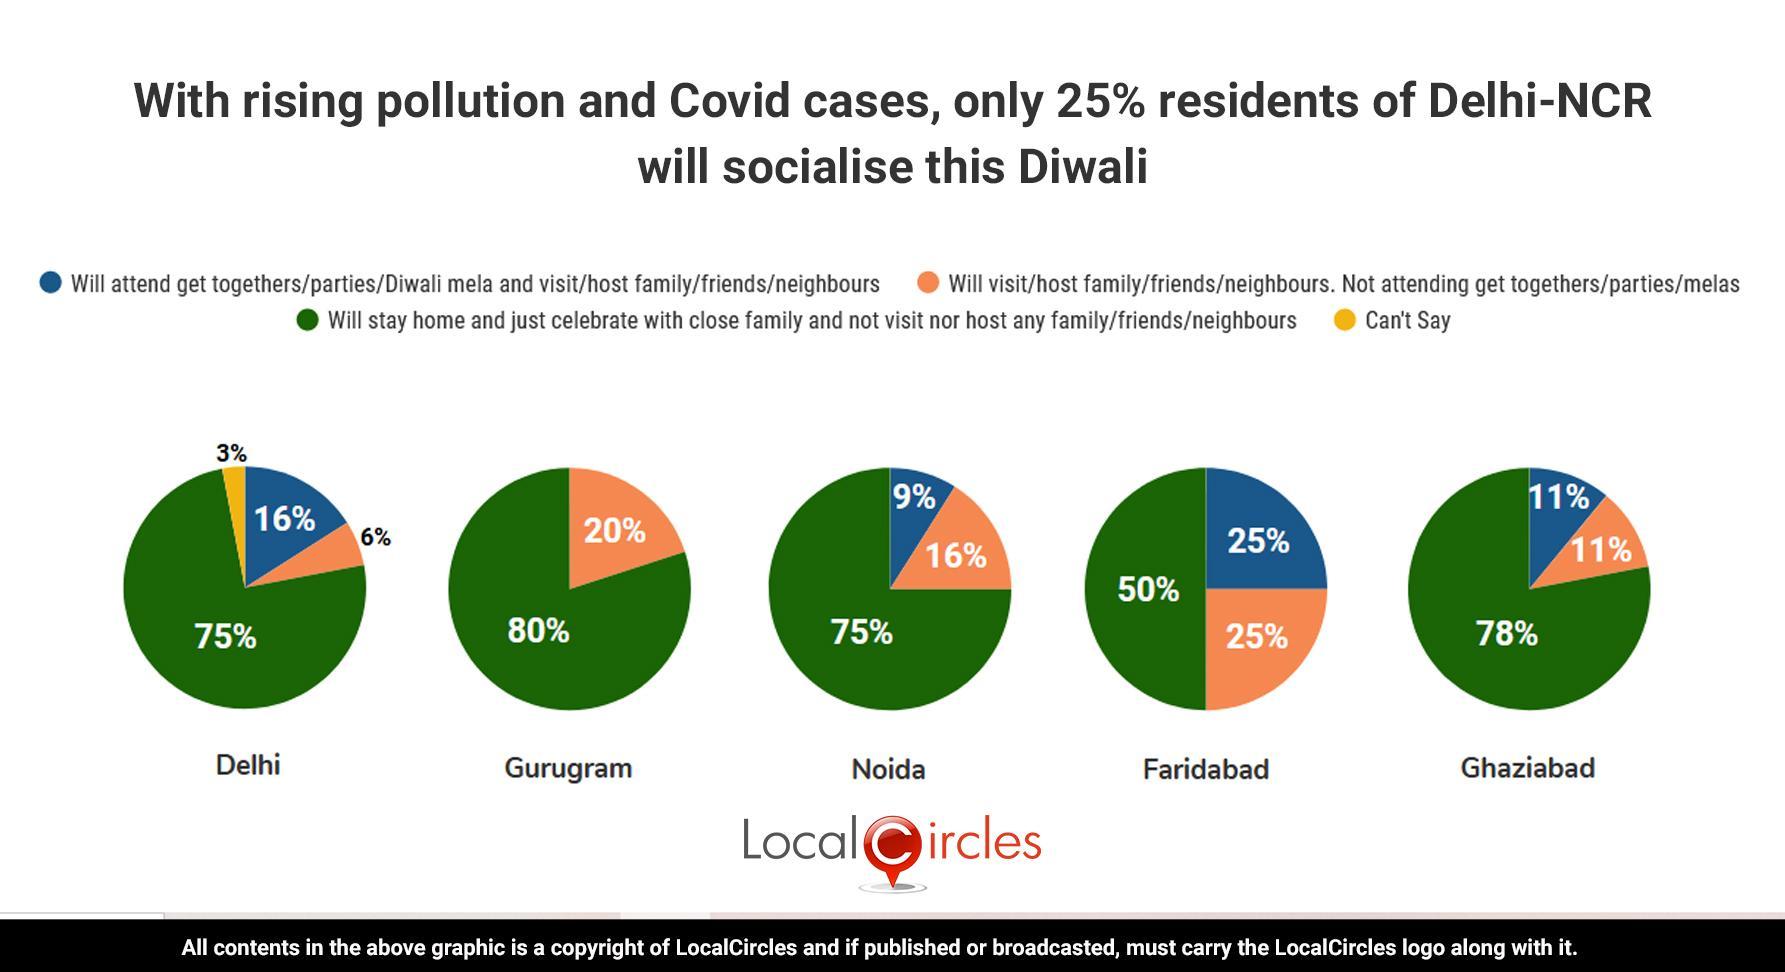 via_LocalCircles_Delhi_NCR_AQI_Polls_-_Summary_-_2___20201111084208___.jpg